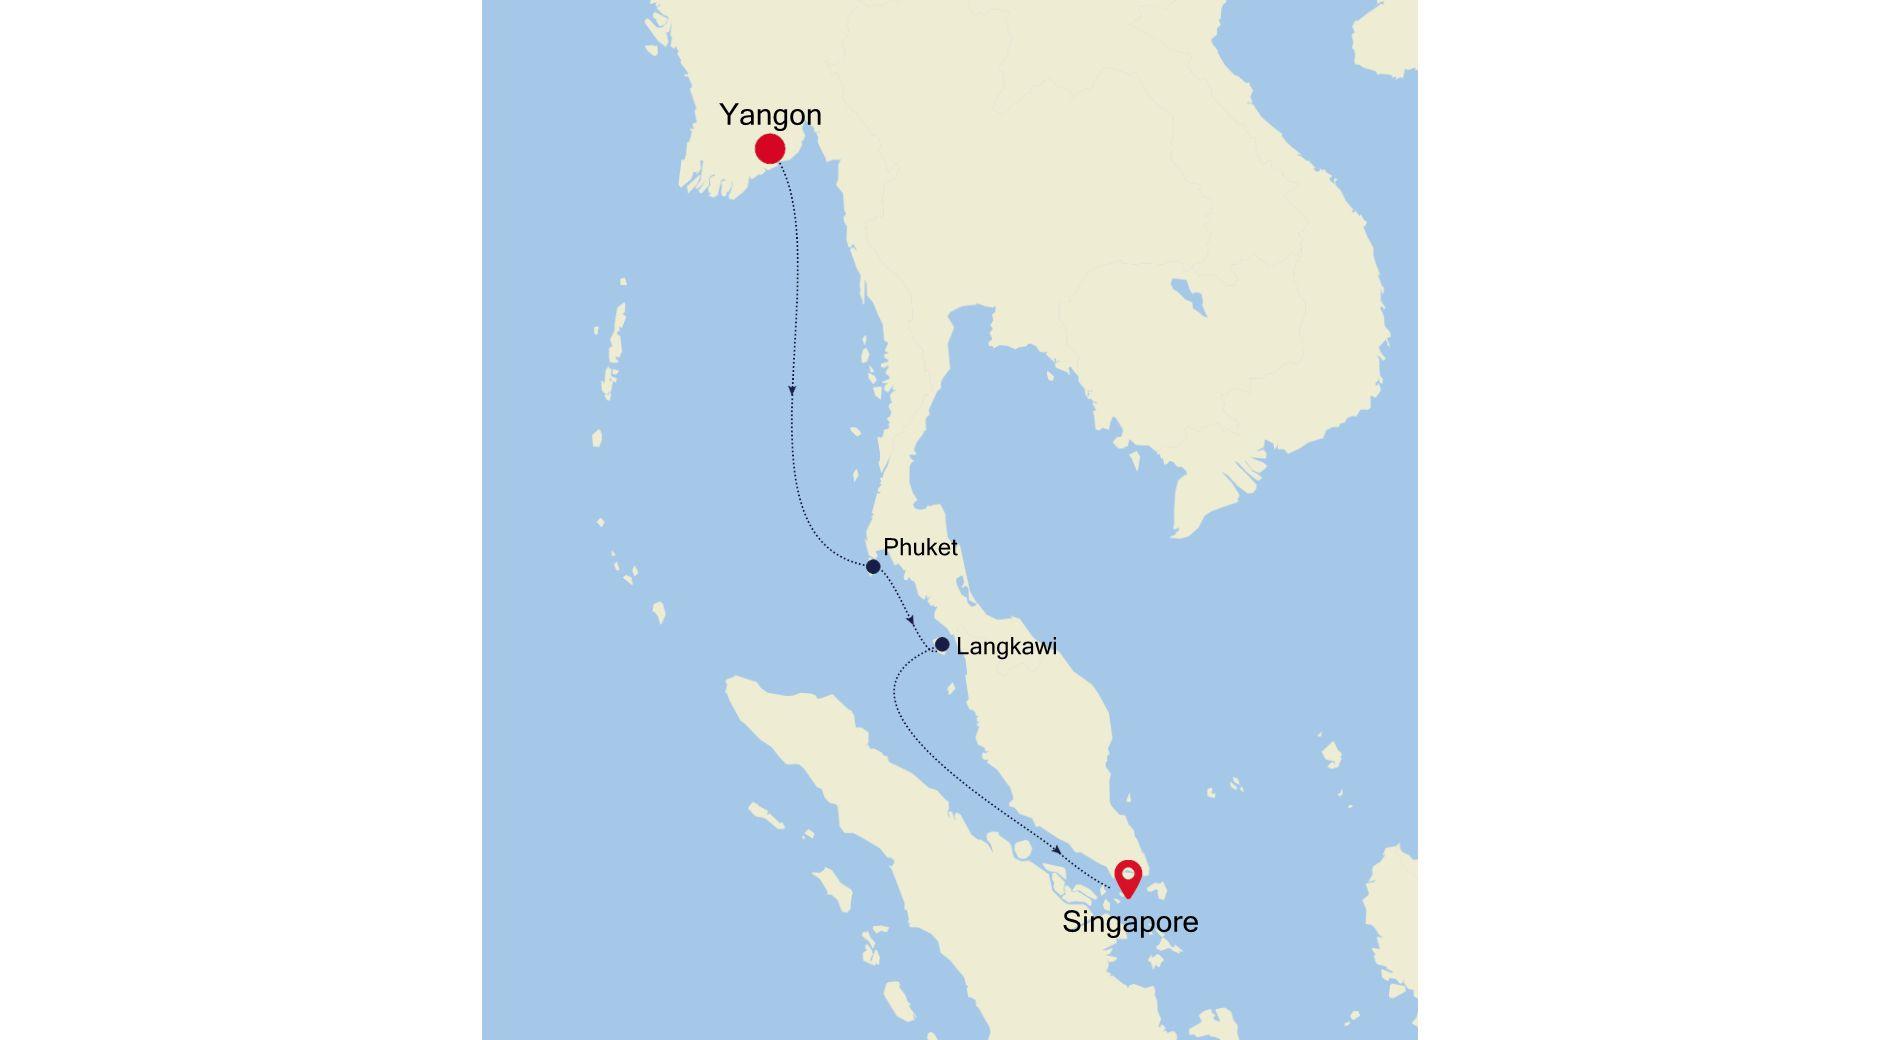 3907Q - Yangon nach Singapore